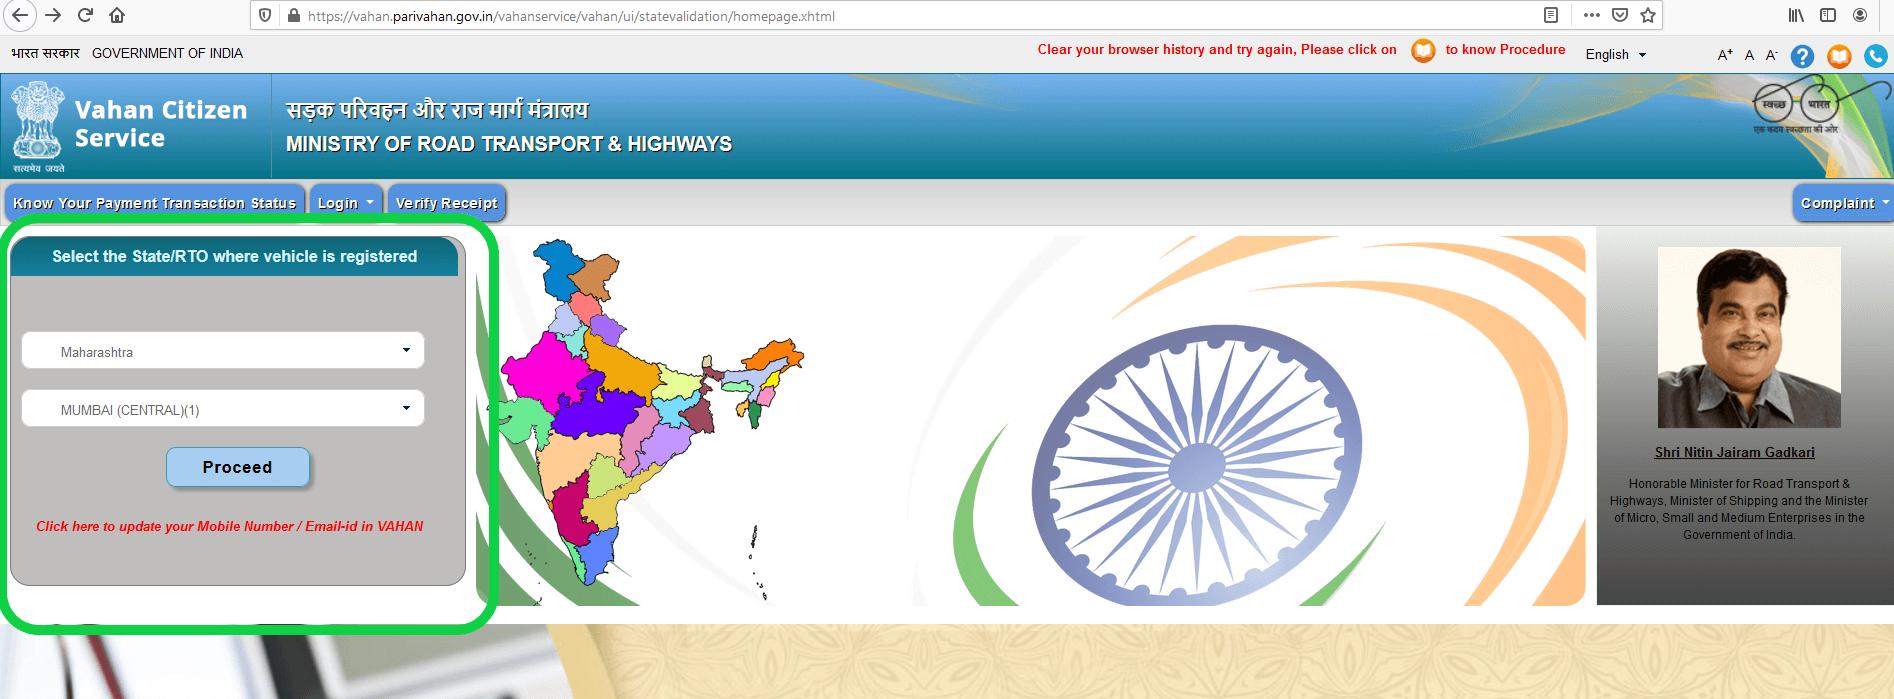 vahan citizen services homepage